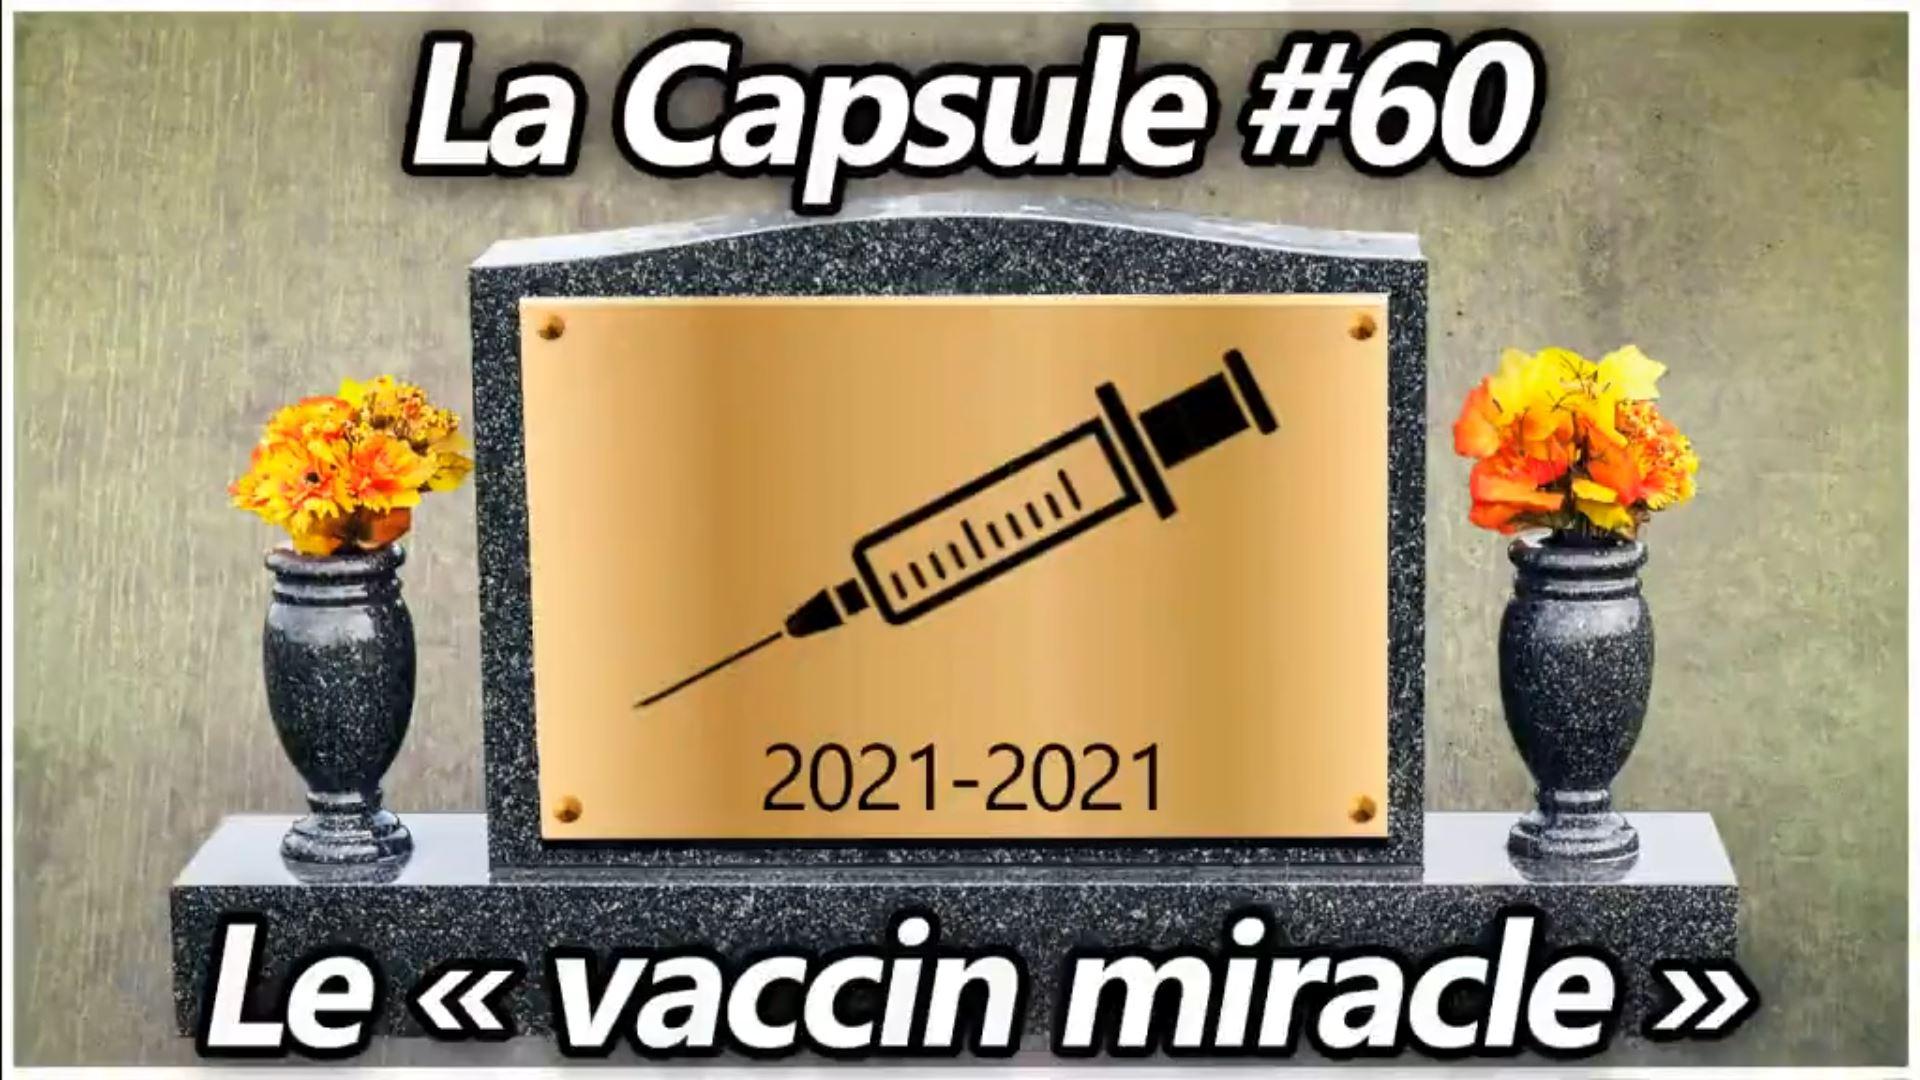 La Capsule #60 – Le vaccin miracle